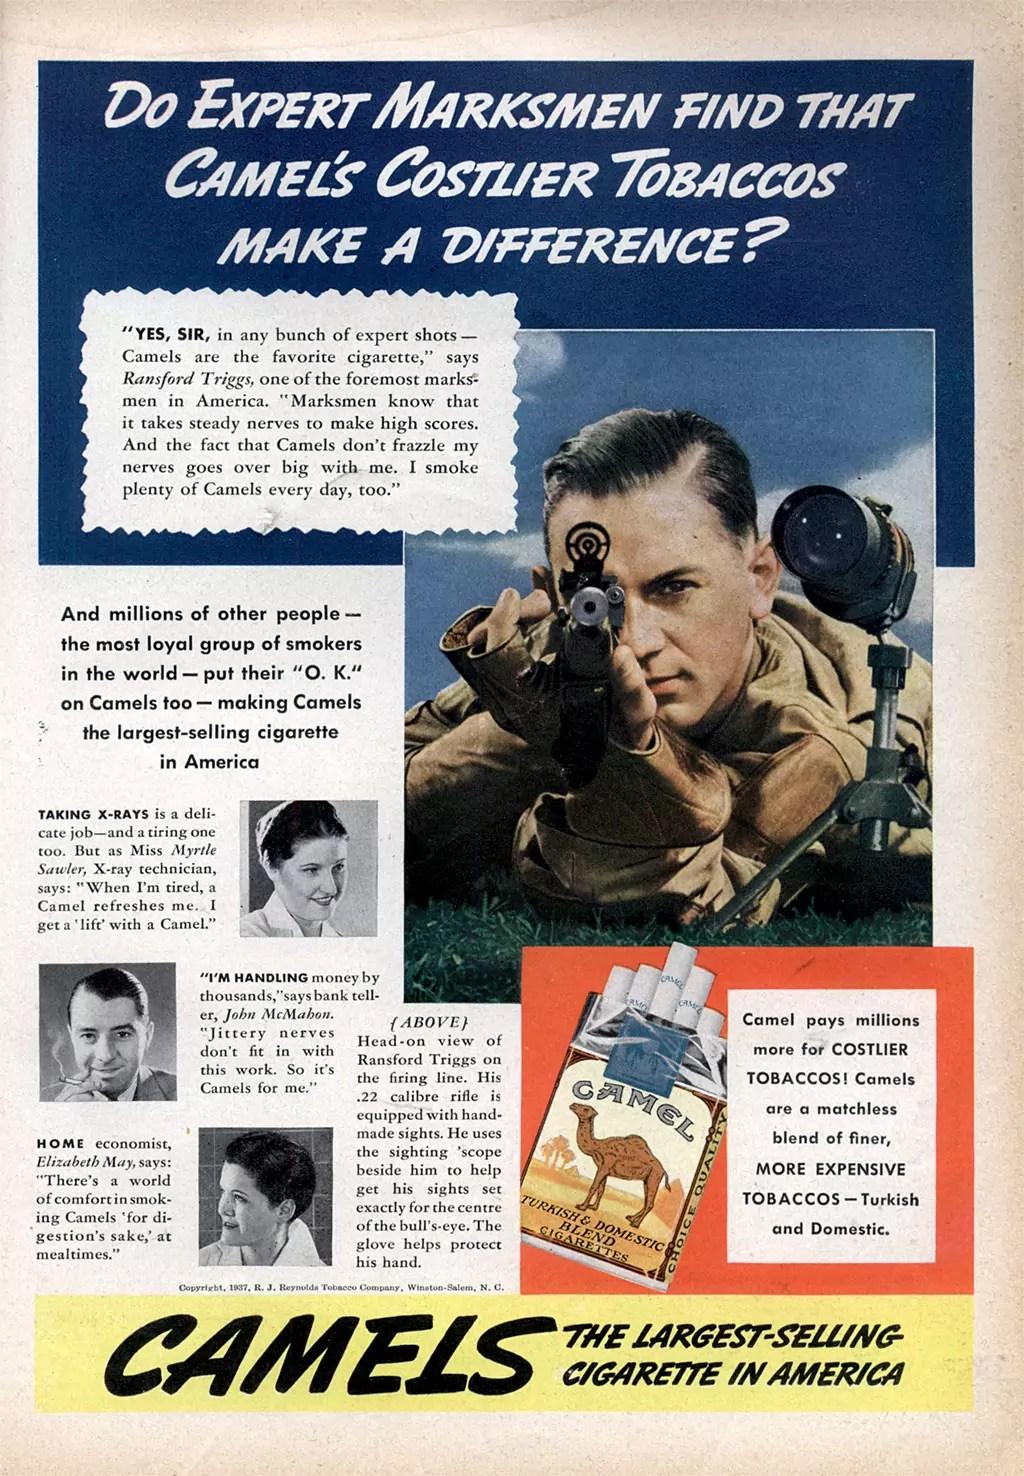 Smoke Camel Cigarettes, Become a Better Marksman. 1937 Ad